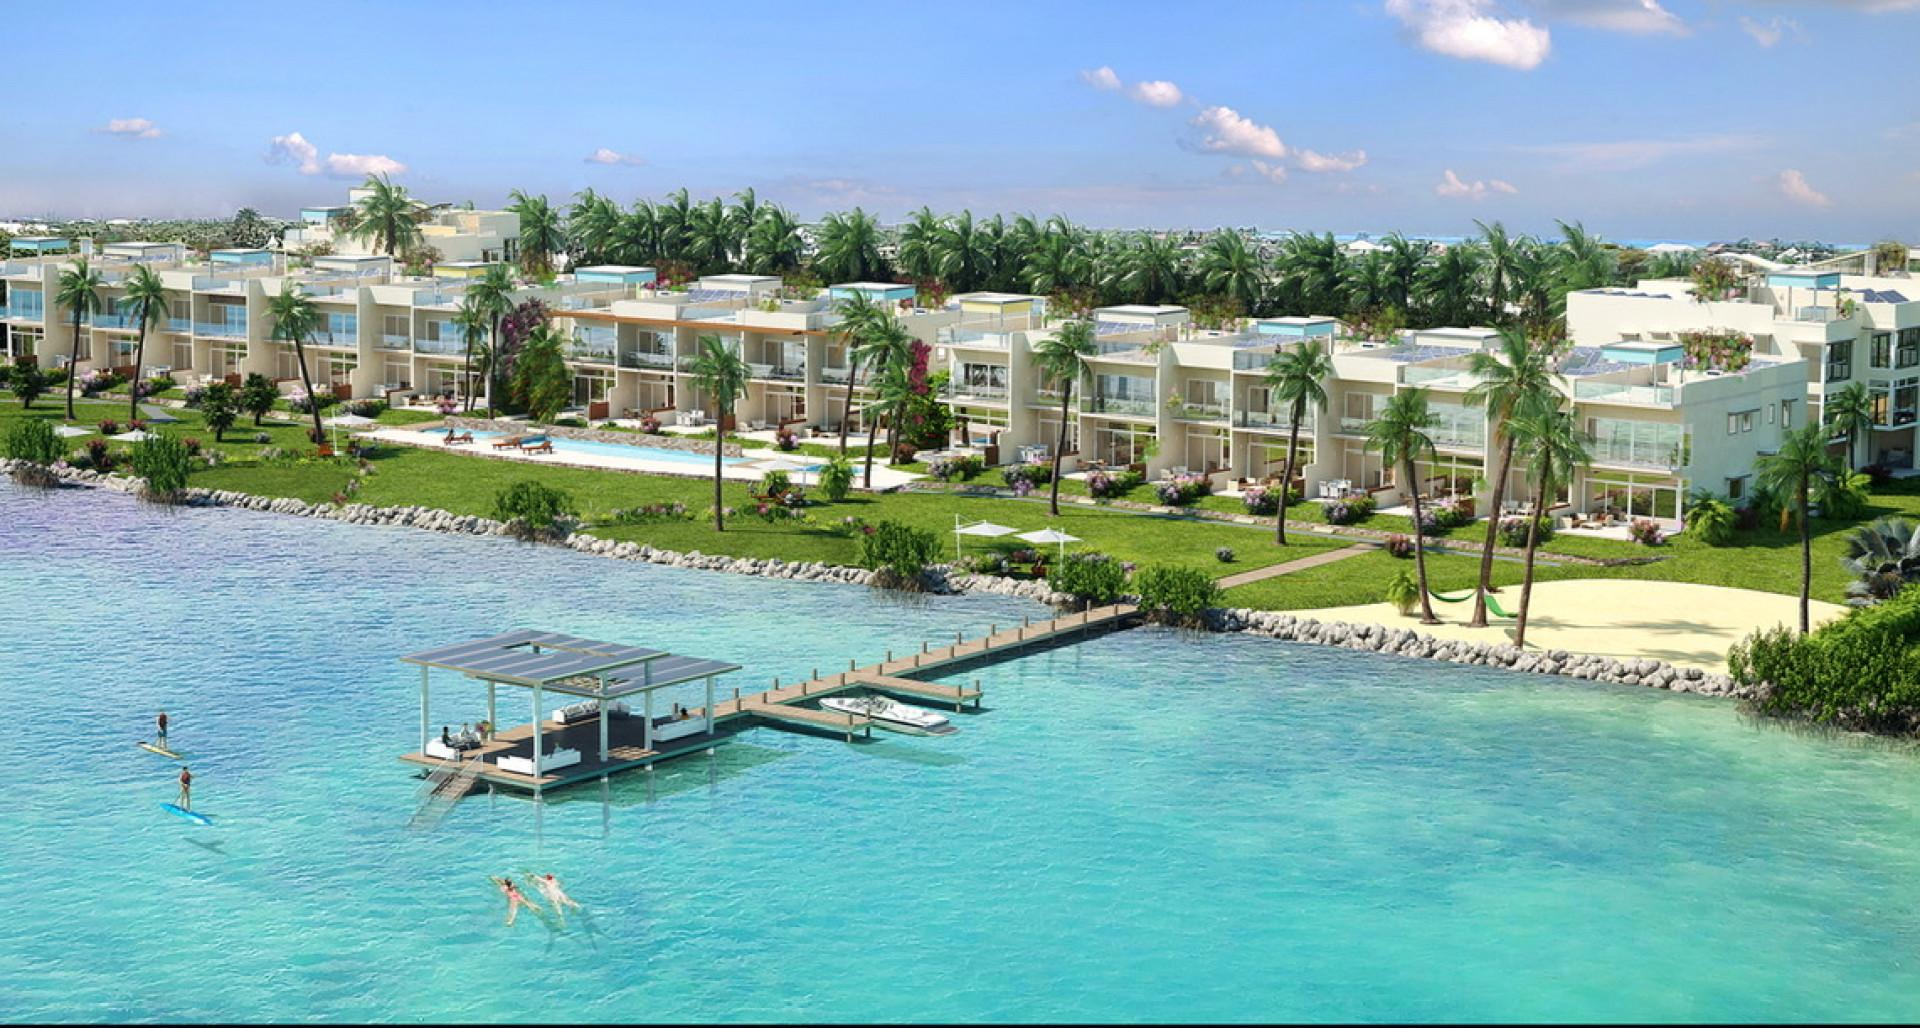 Indigo Bay Seaview Residence #1